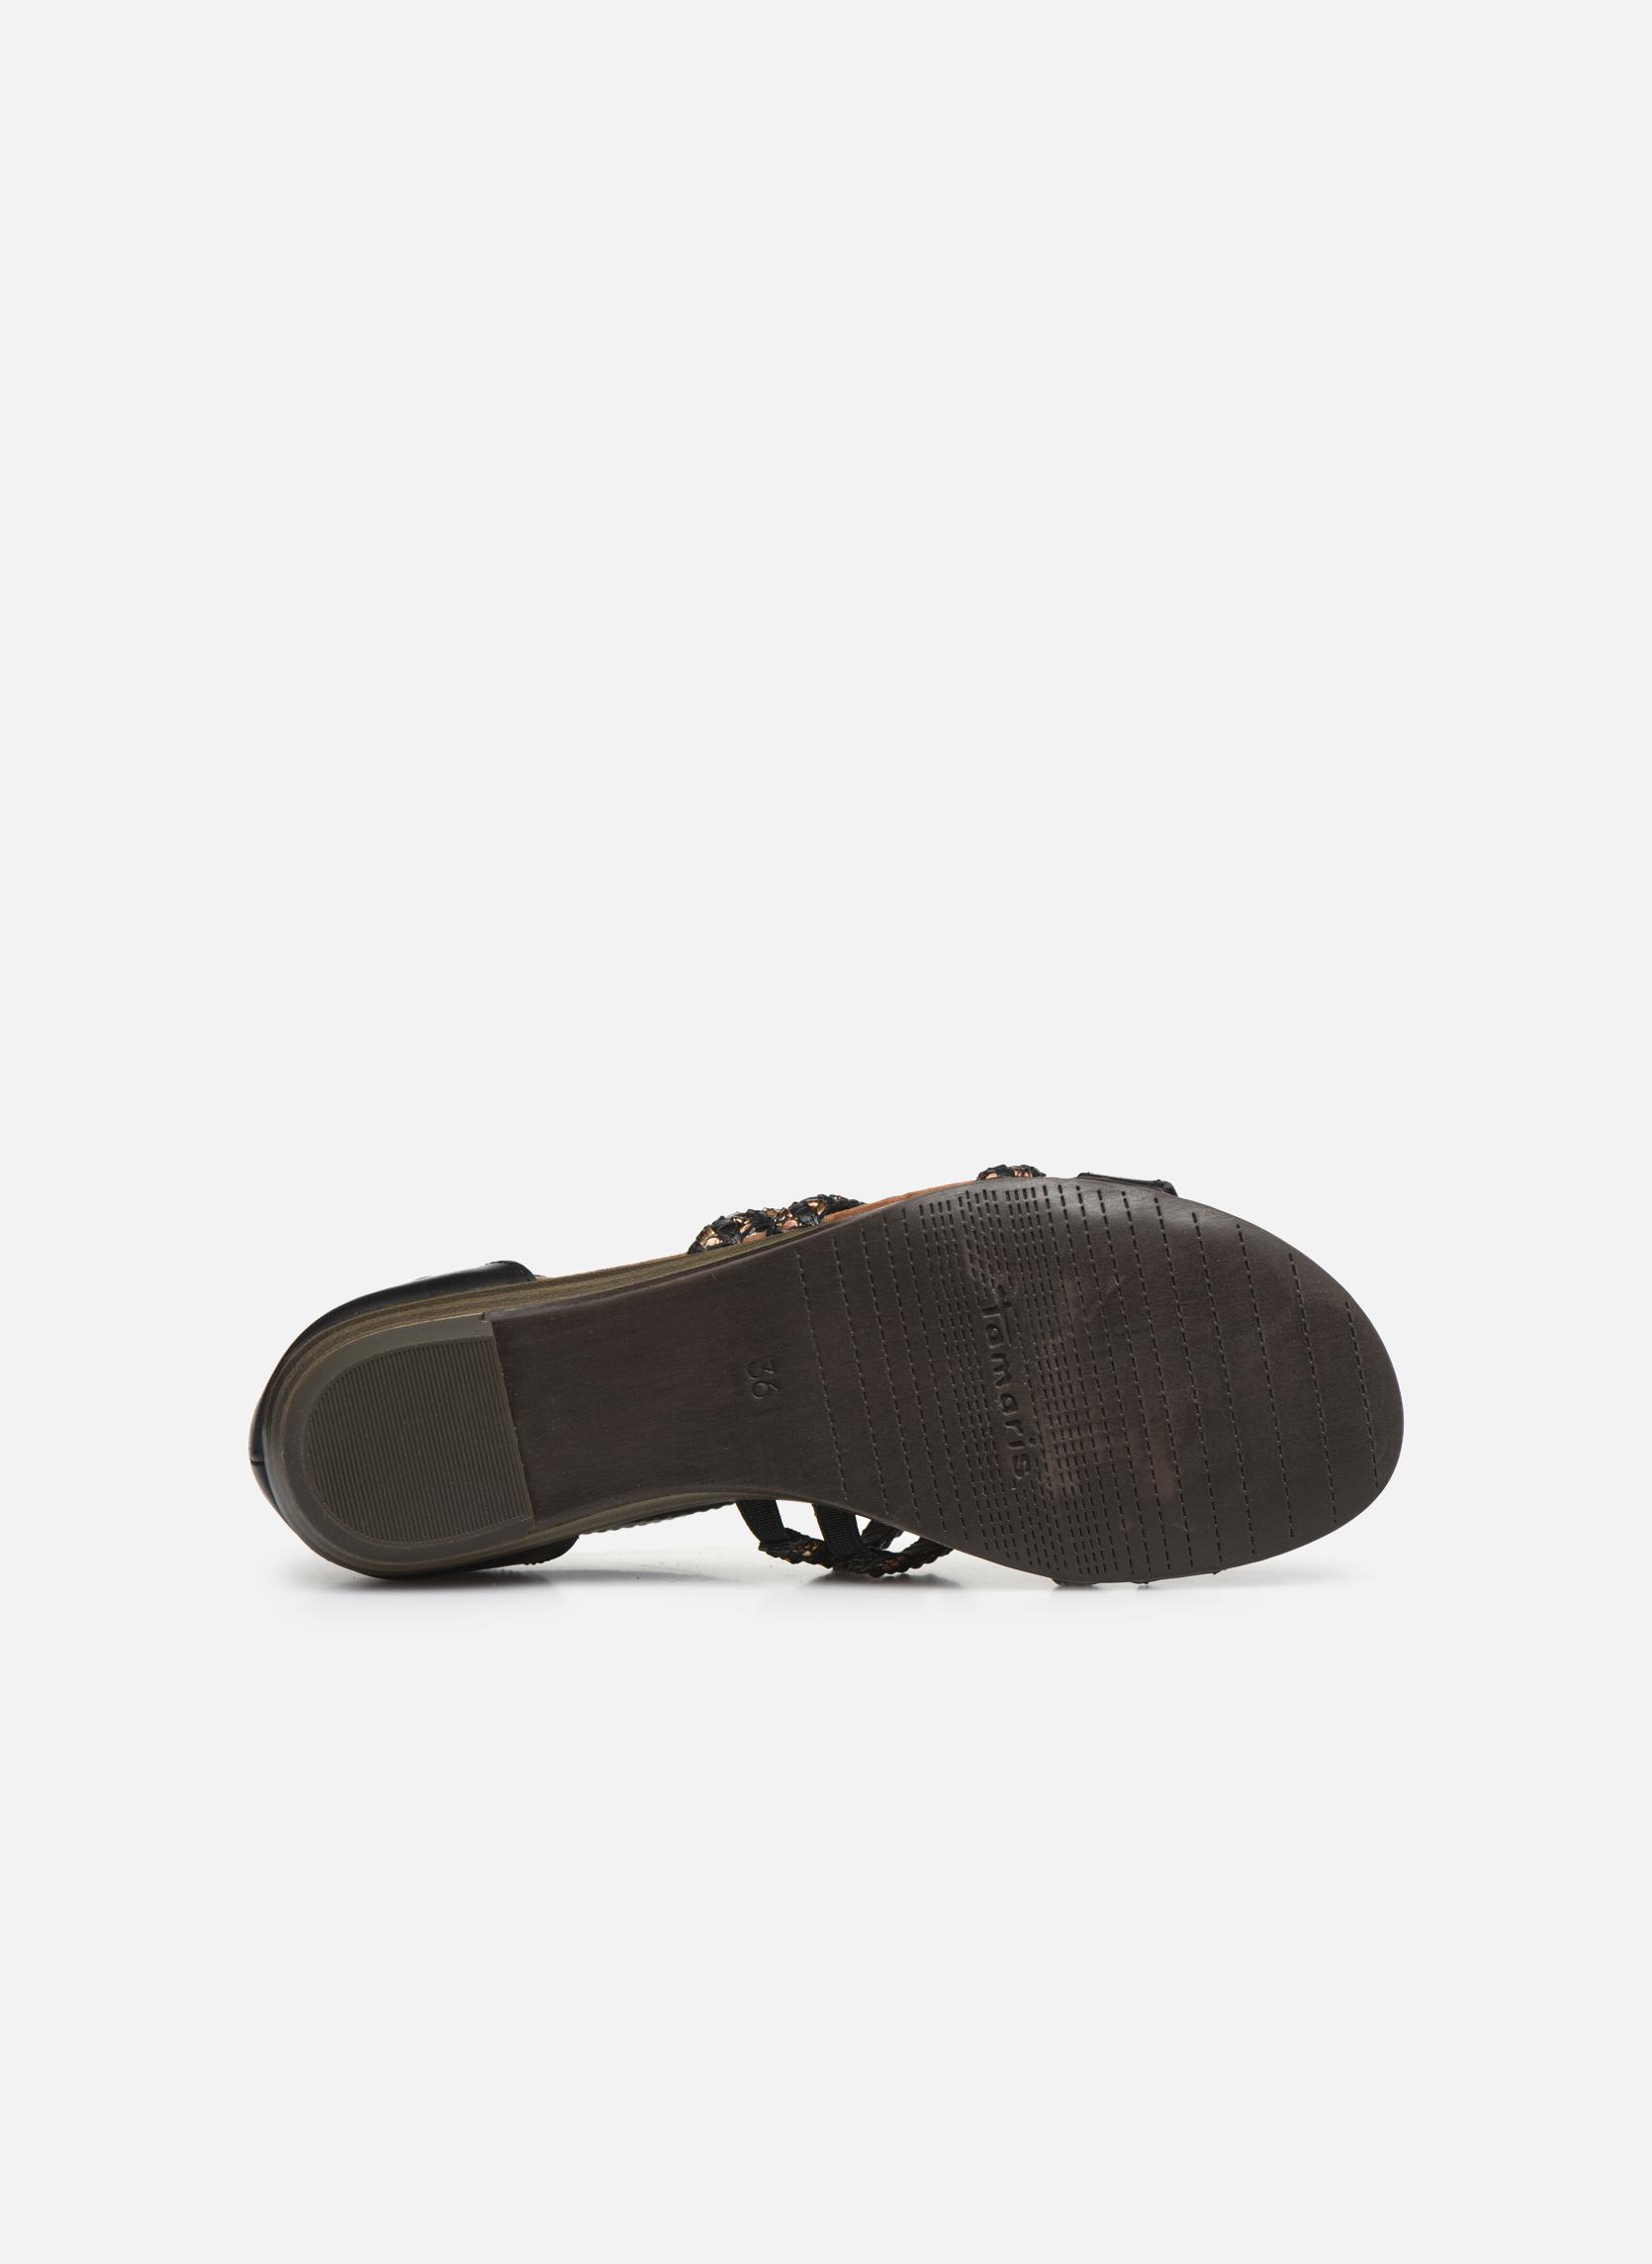 Muscari Black/ Bronce